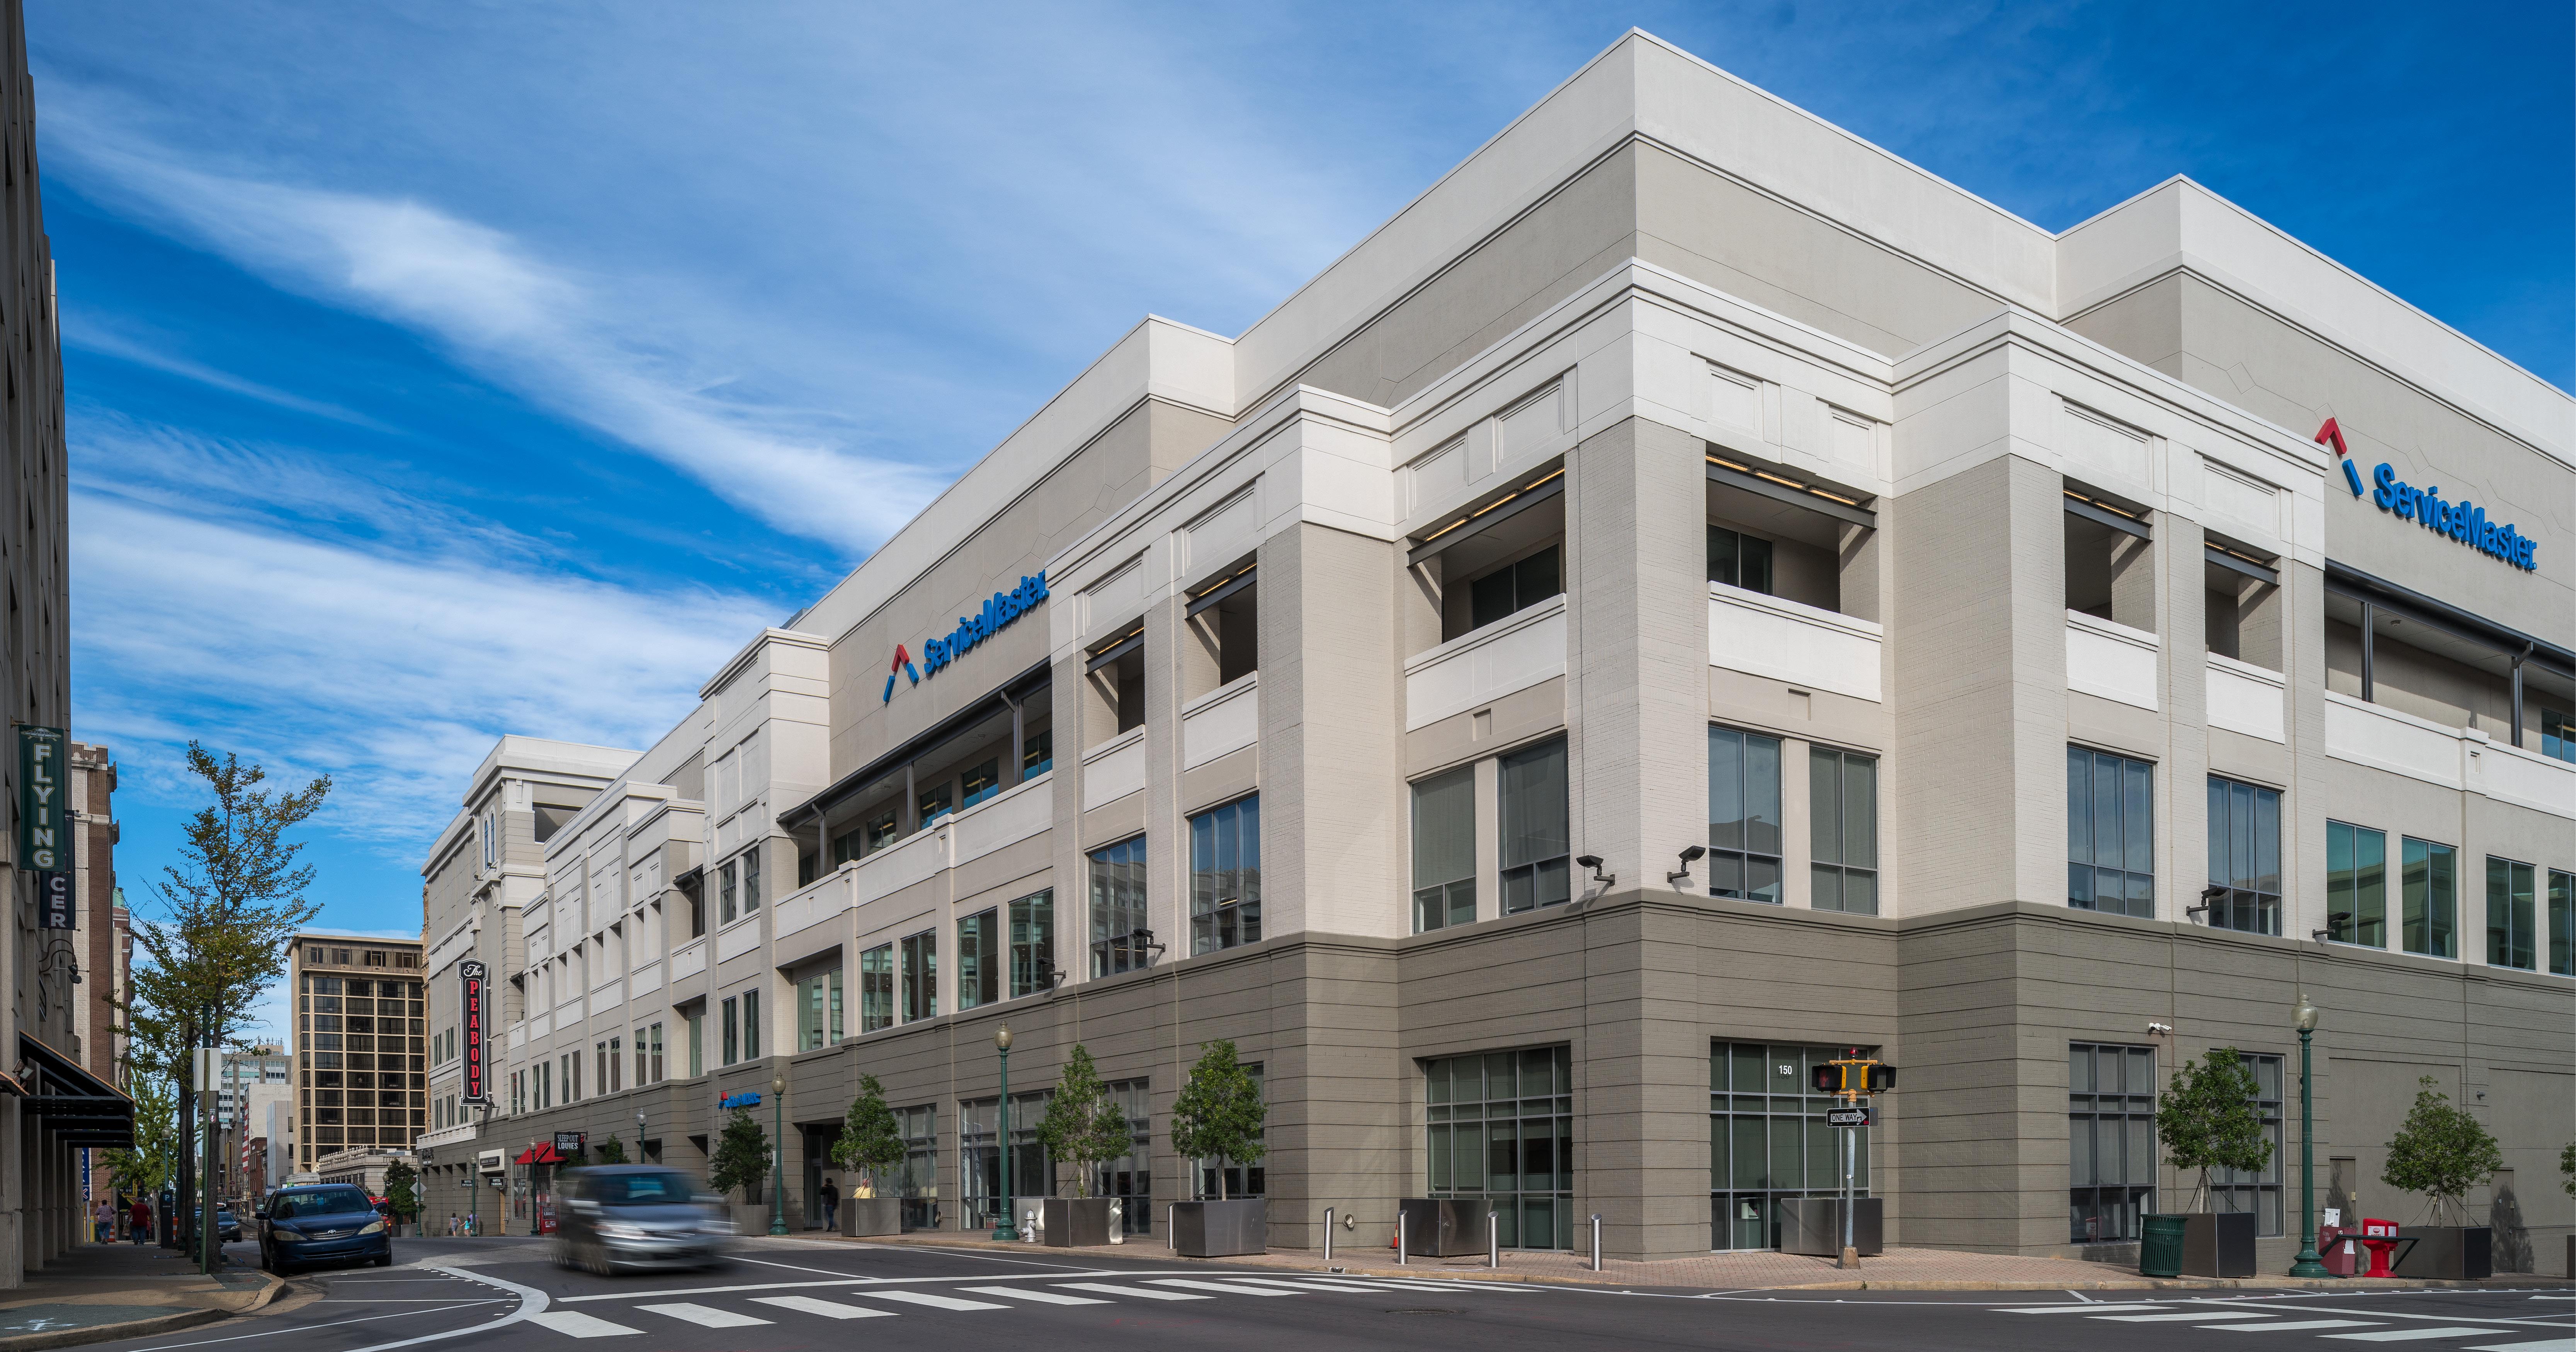 ServiceMaster Corporate Headquarters, Memphis, TN